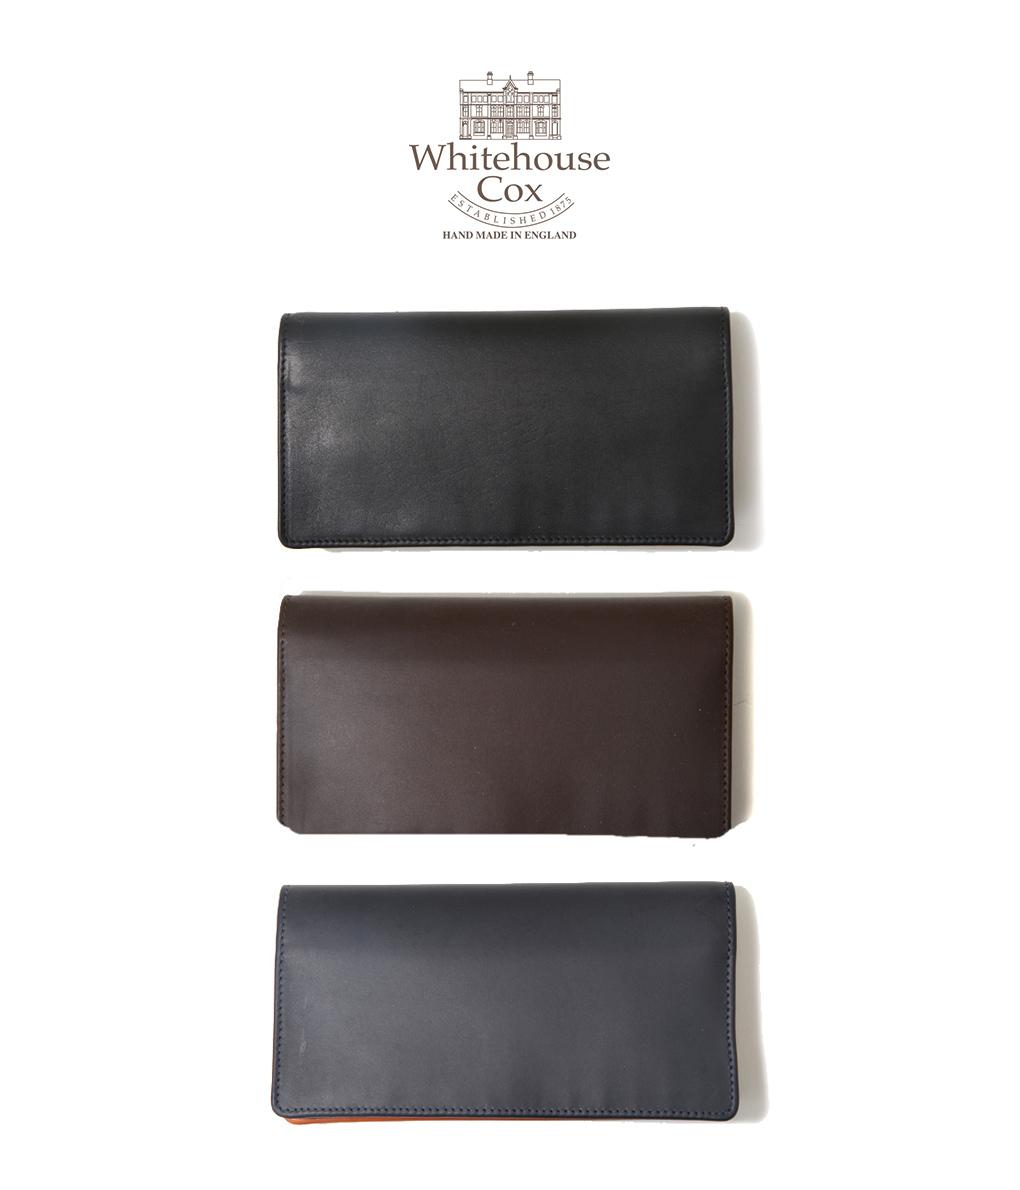 Whitehouse Cox / ホワイトハウスコックス : LONG WALLET / 全3色 : ホワイトハウス レザー 財布 ロングウォレット 長財布 ダービー 馬革 ラッピング可能 : S8819-DERBY-57【MUS】